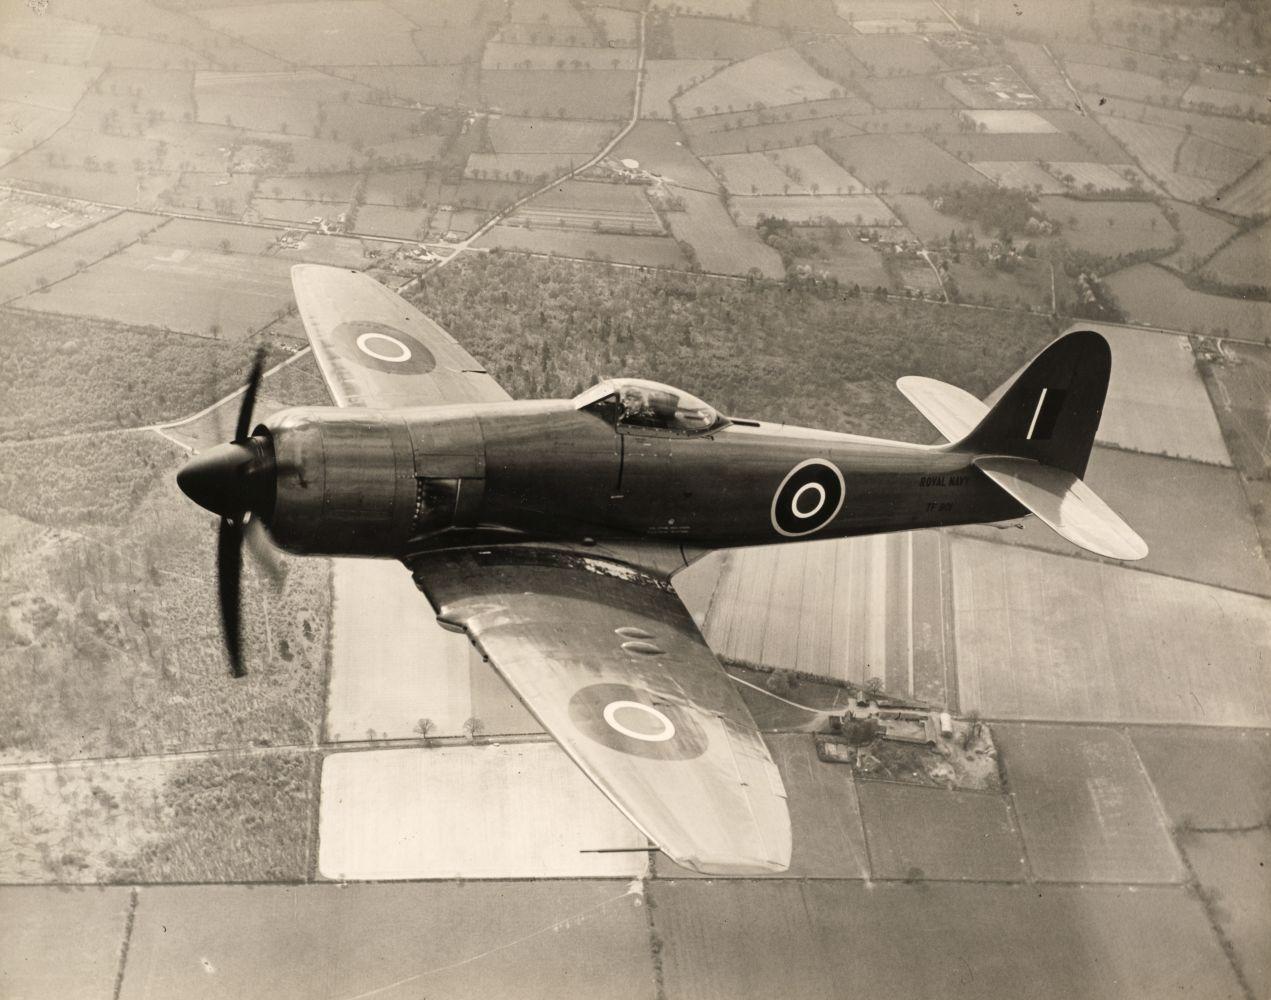 * Aviation Photographs - Bristol Blenheim, Sea Fury and others